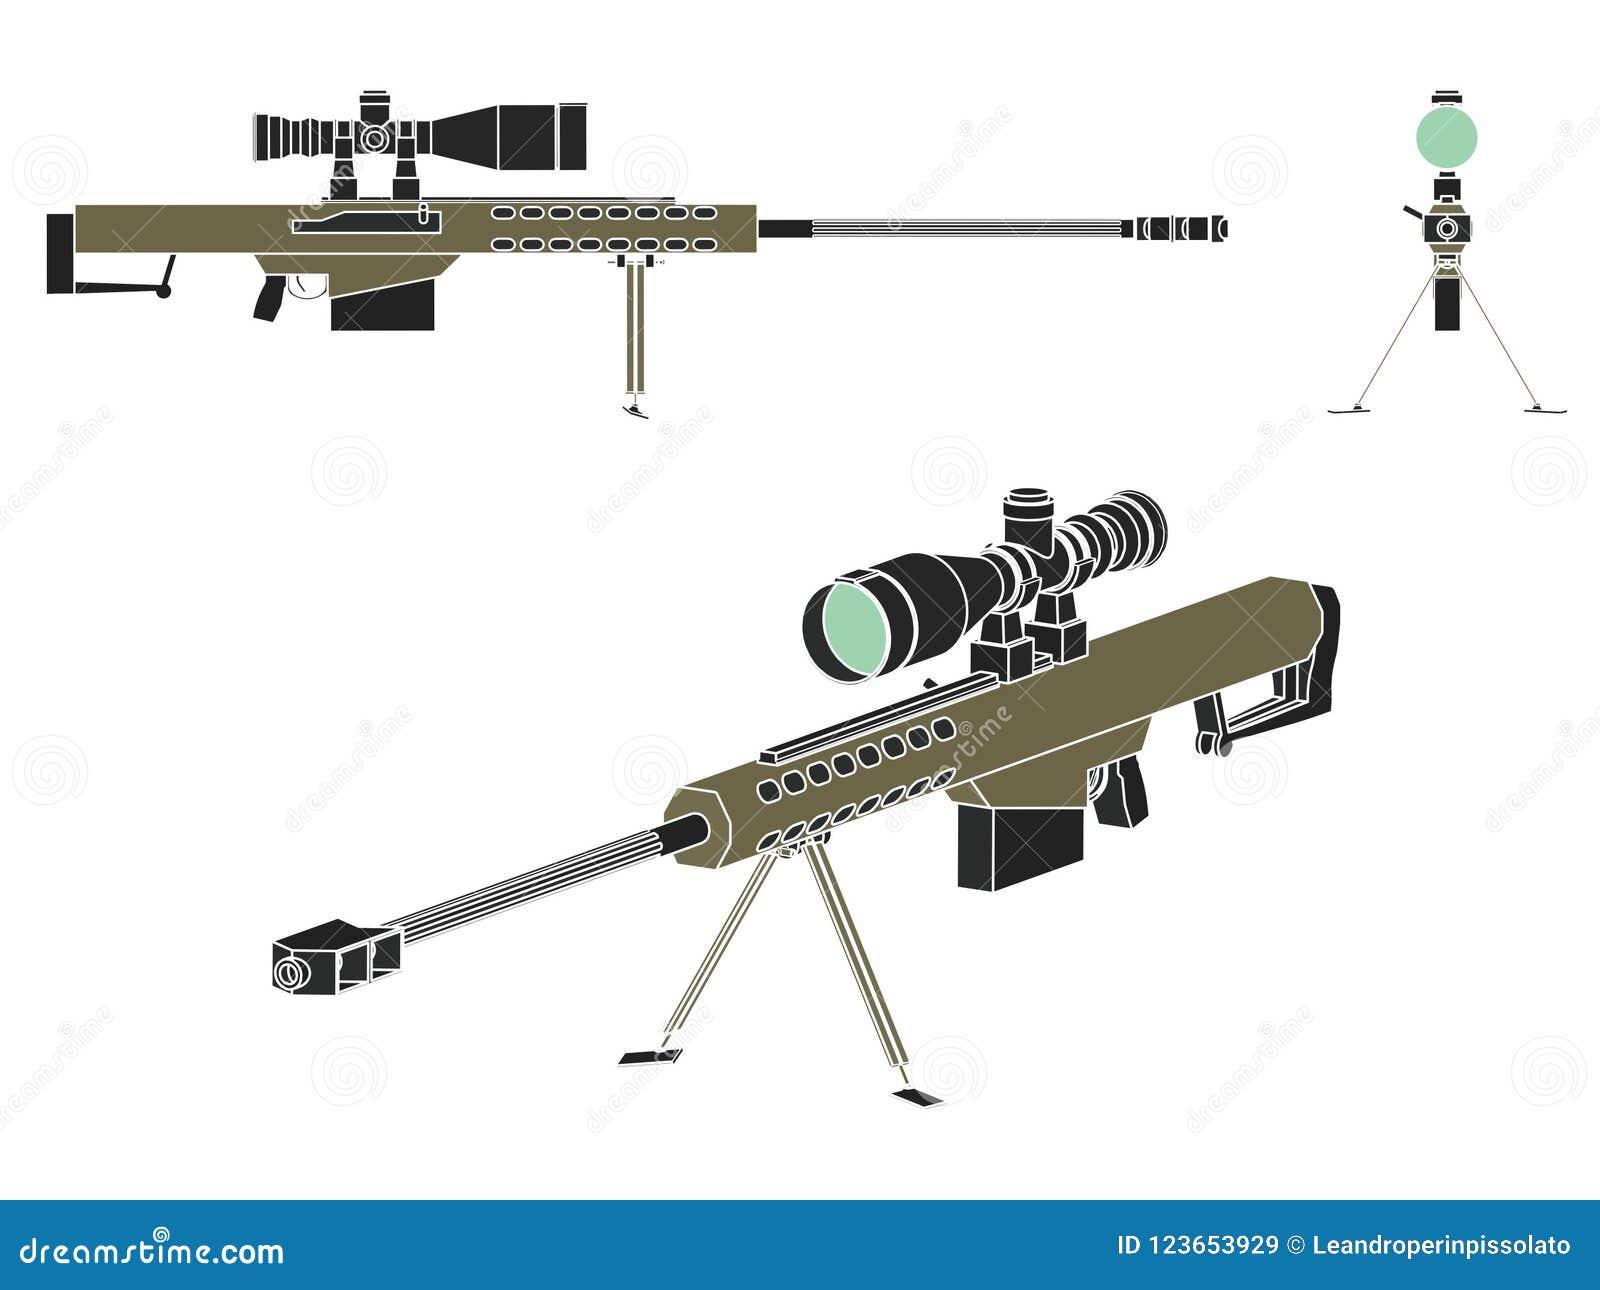 sniper gun without outline stock vector illustration of hidden